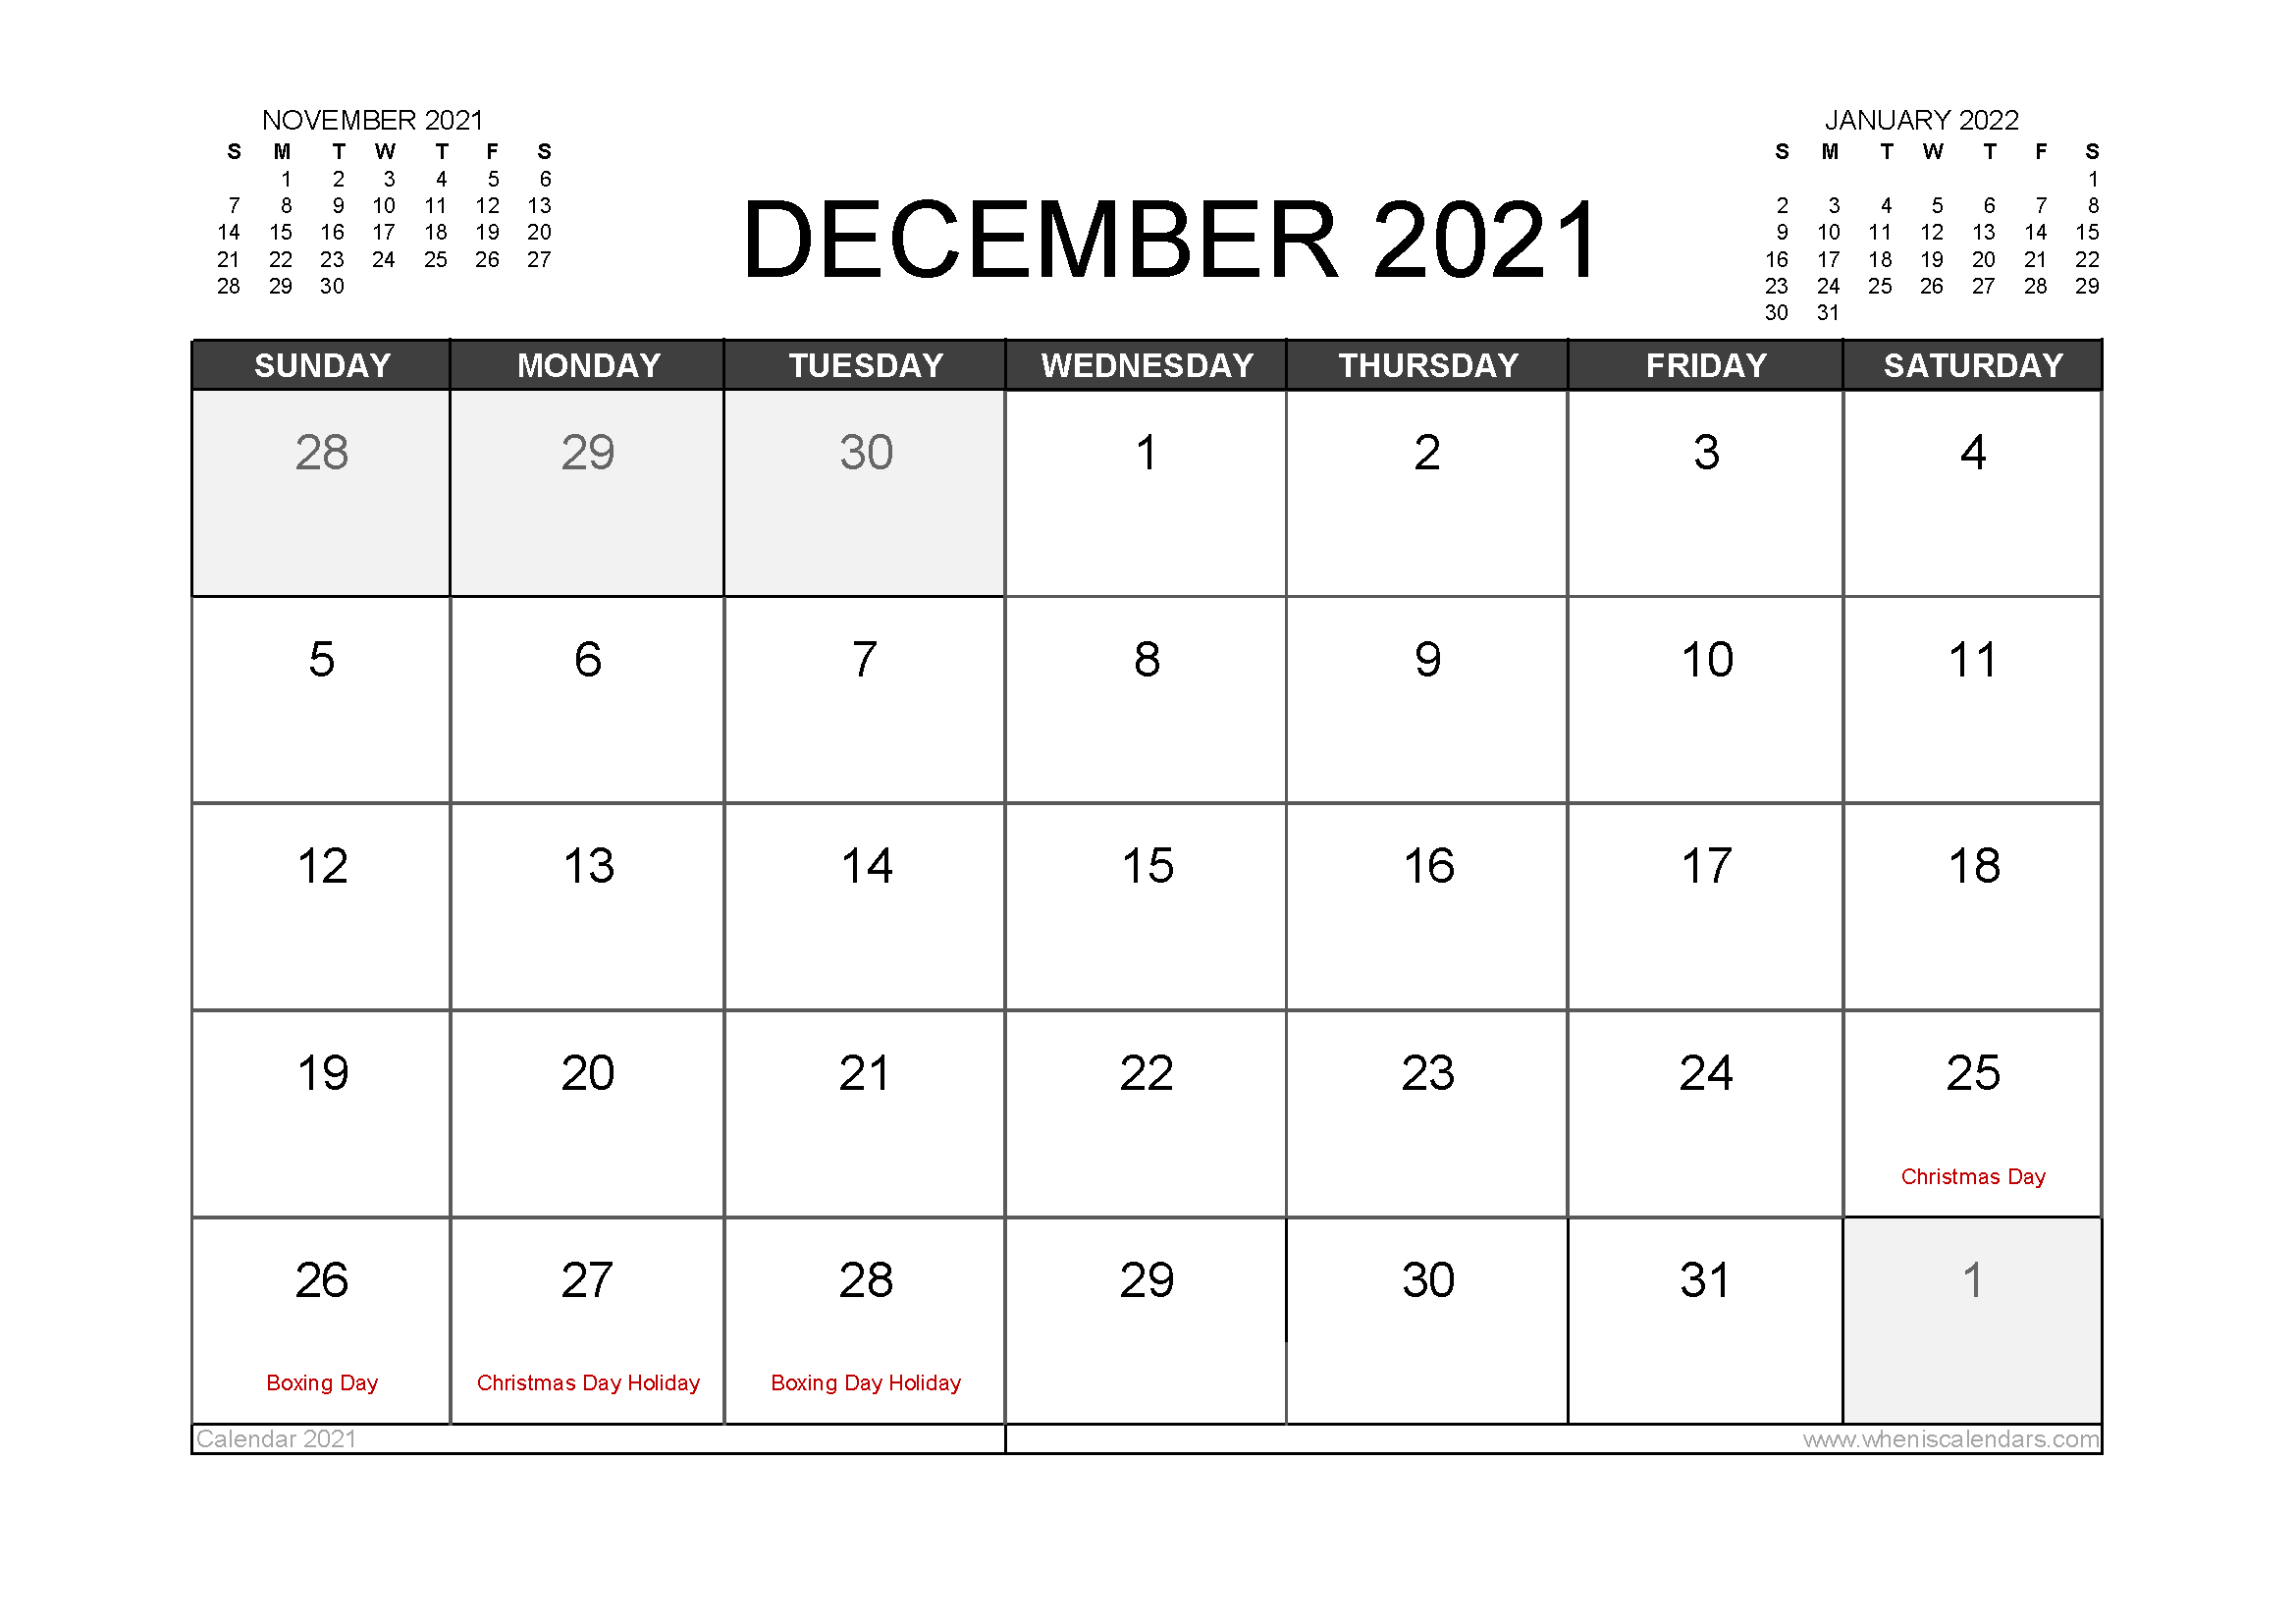 December 2021 Calendar Australia with Holidays